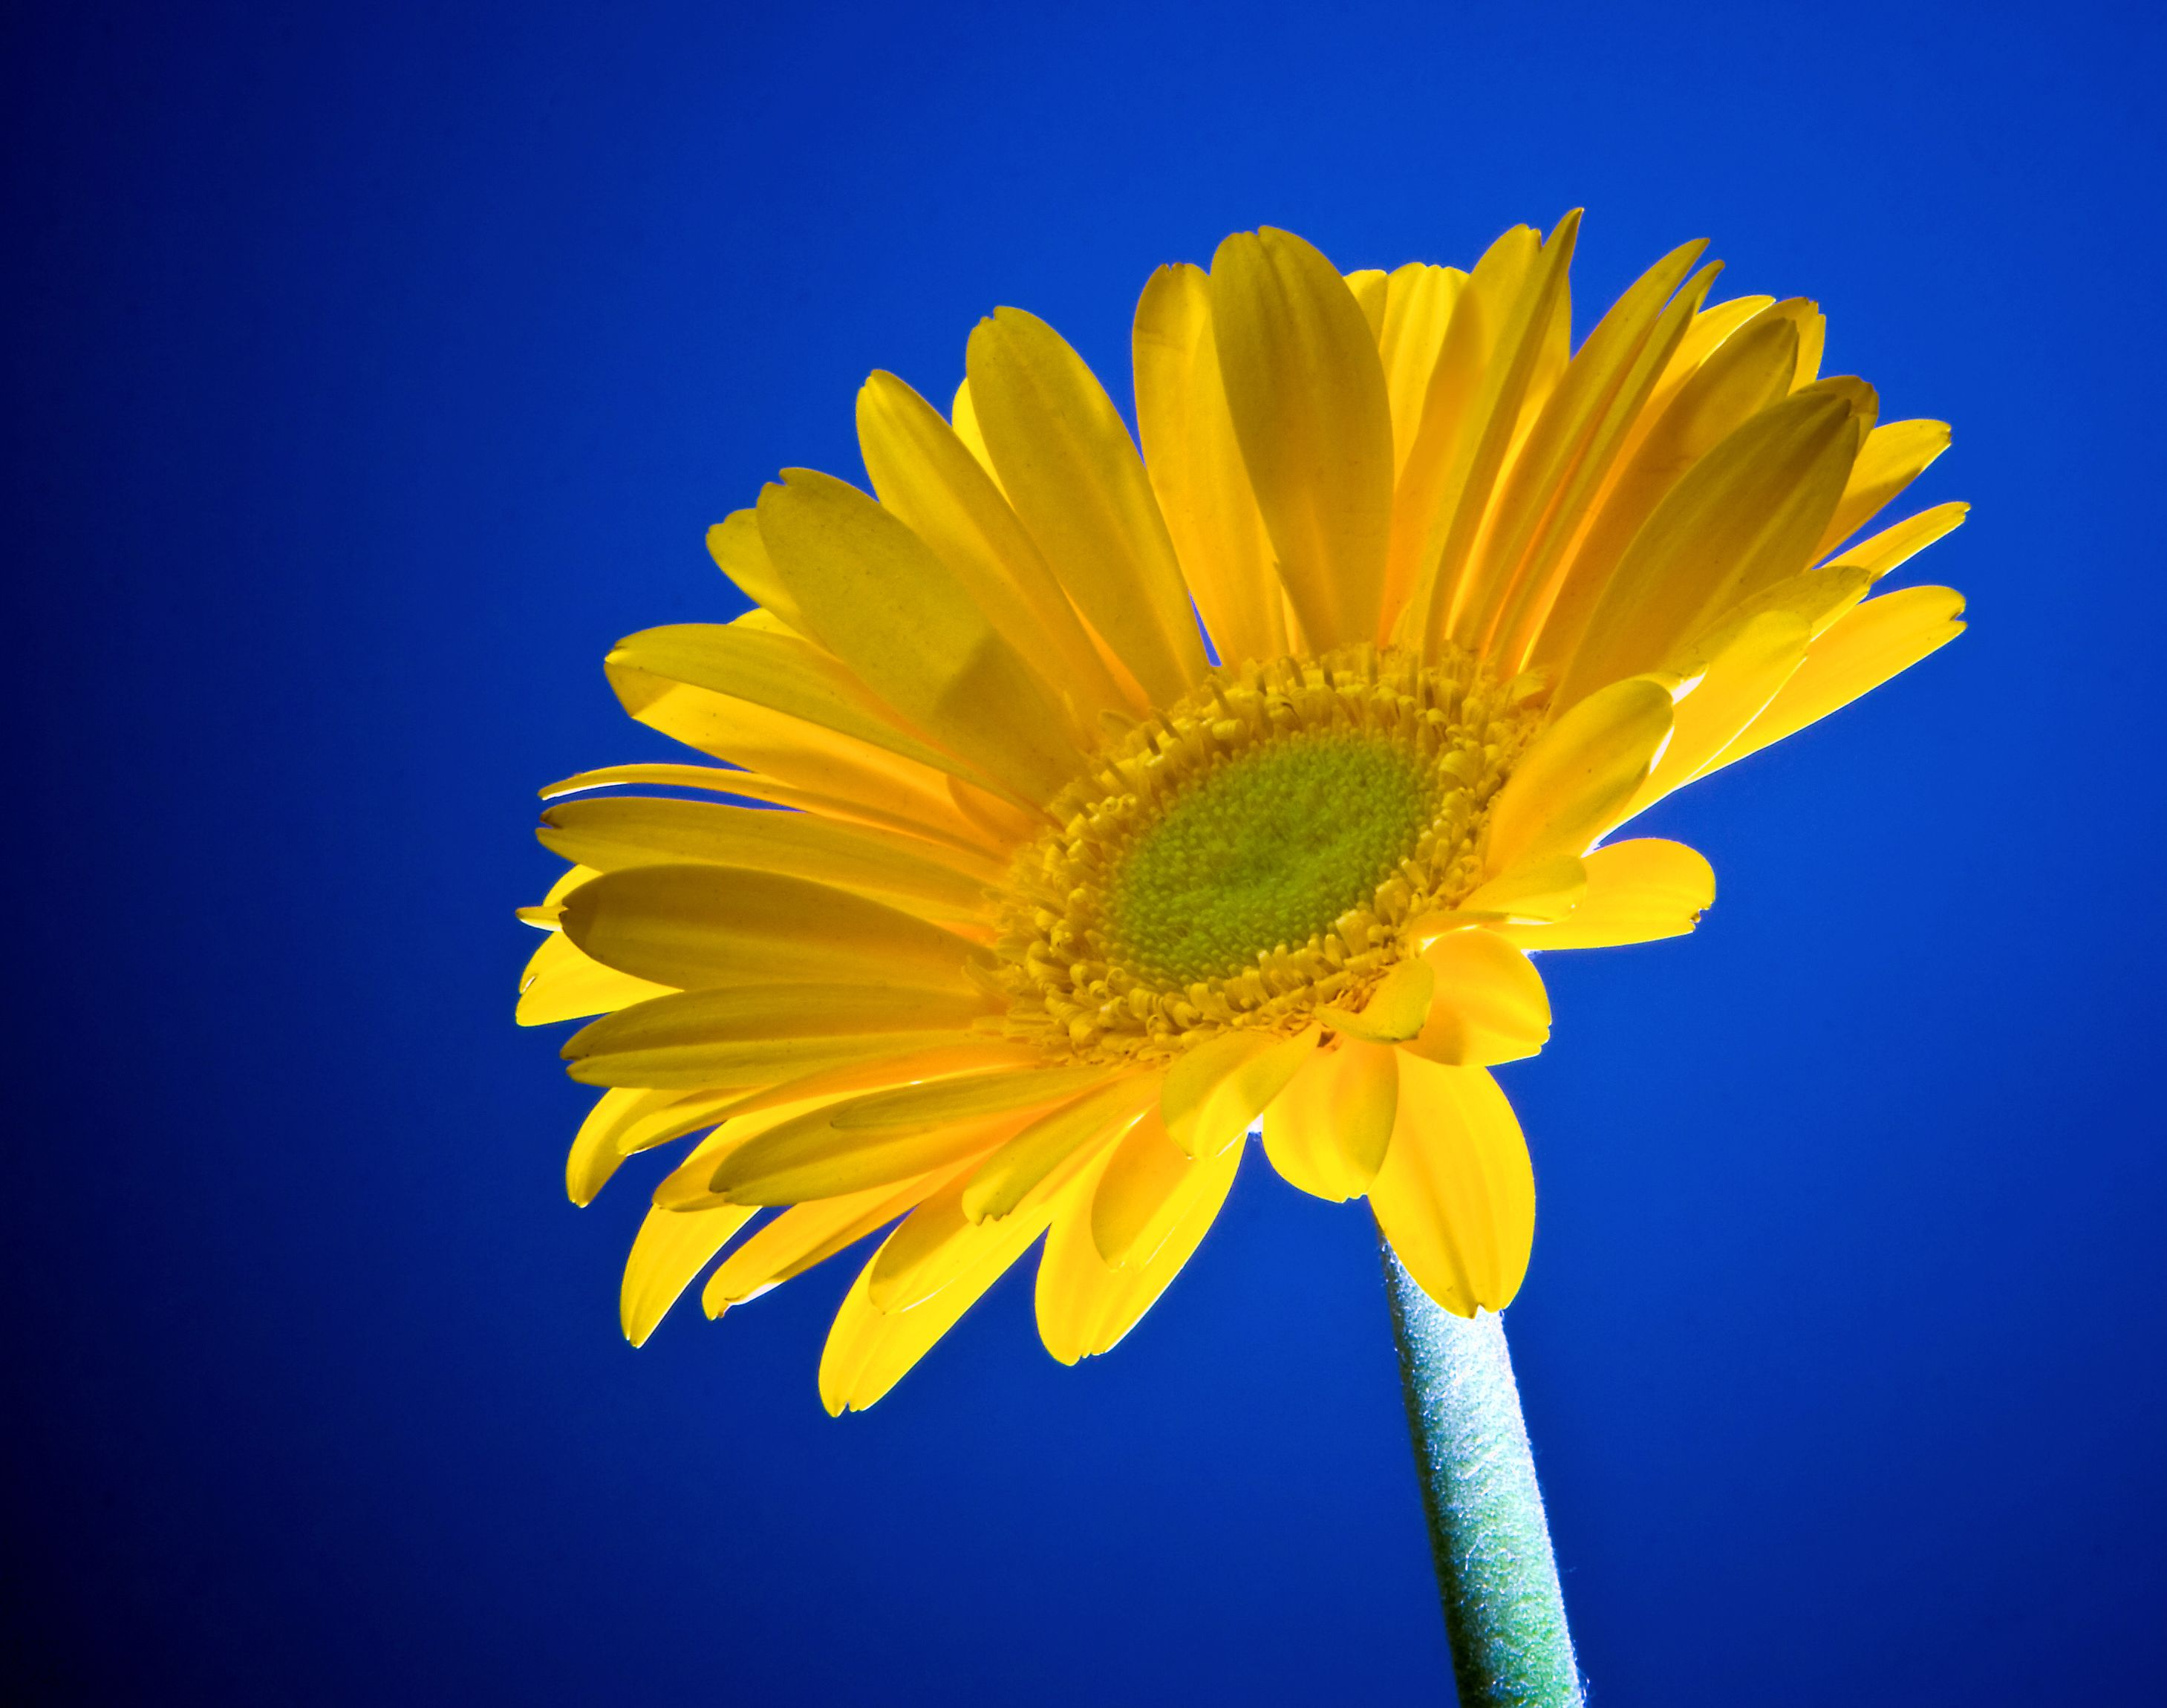 Galleries Product Design Strobist Fubiz Yellow Flowers Gerbera Daisy Flowers